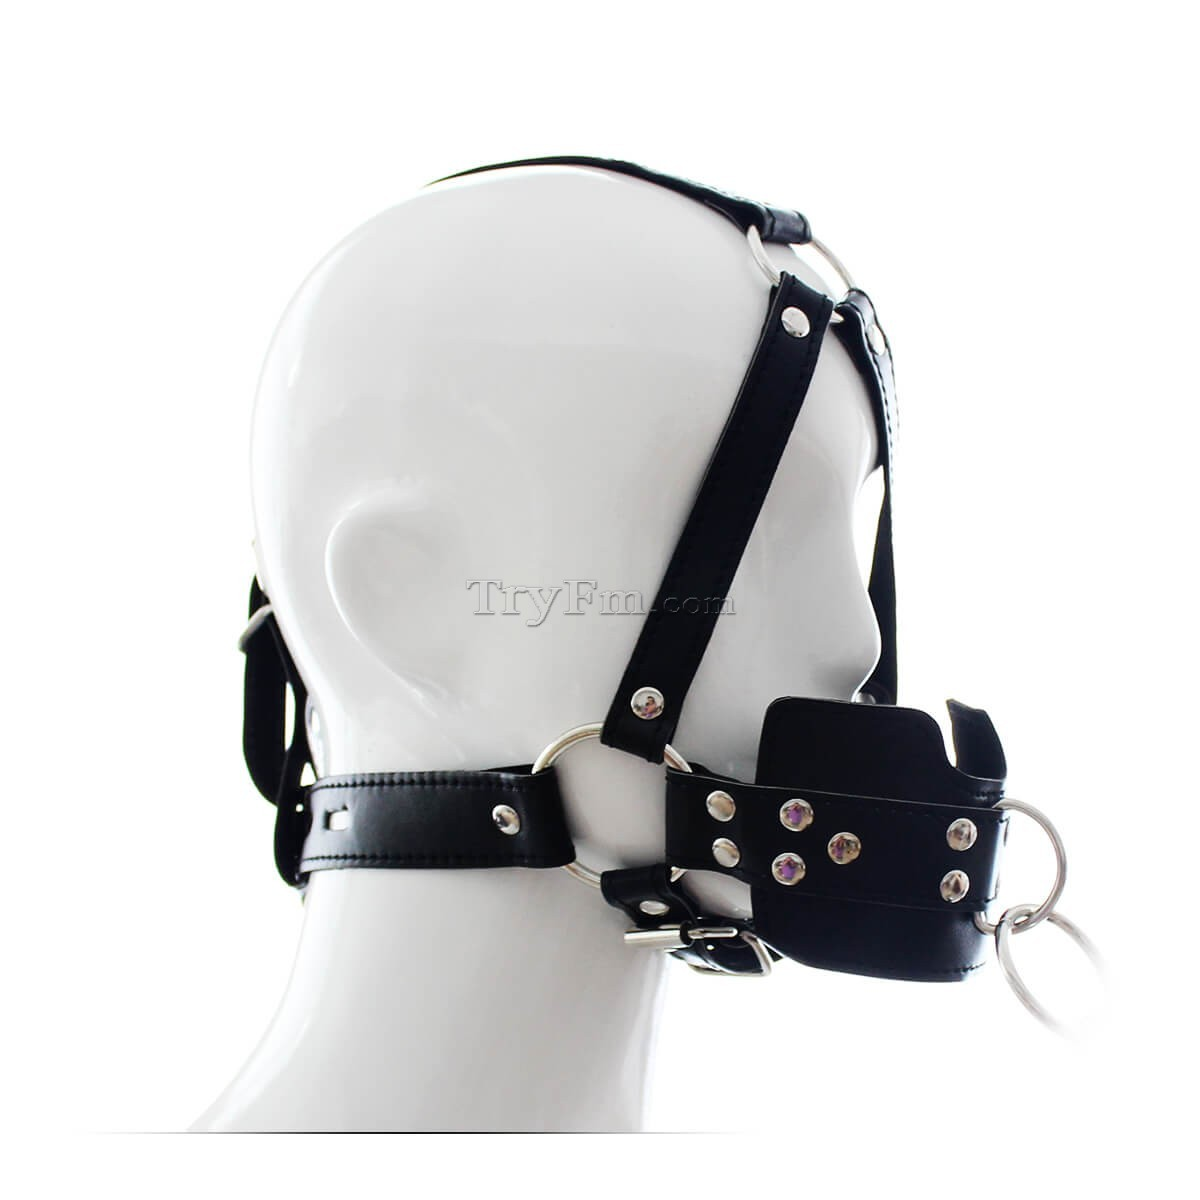 20-Linkable-harness-ball-gag.jpg